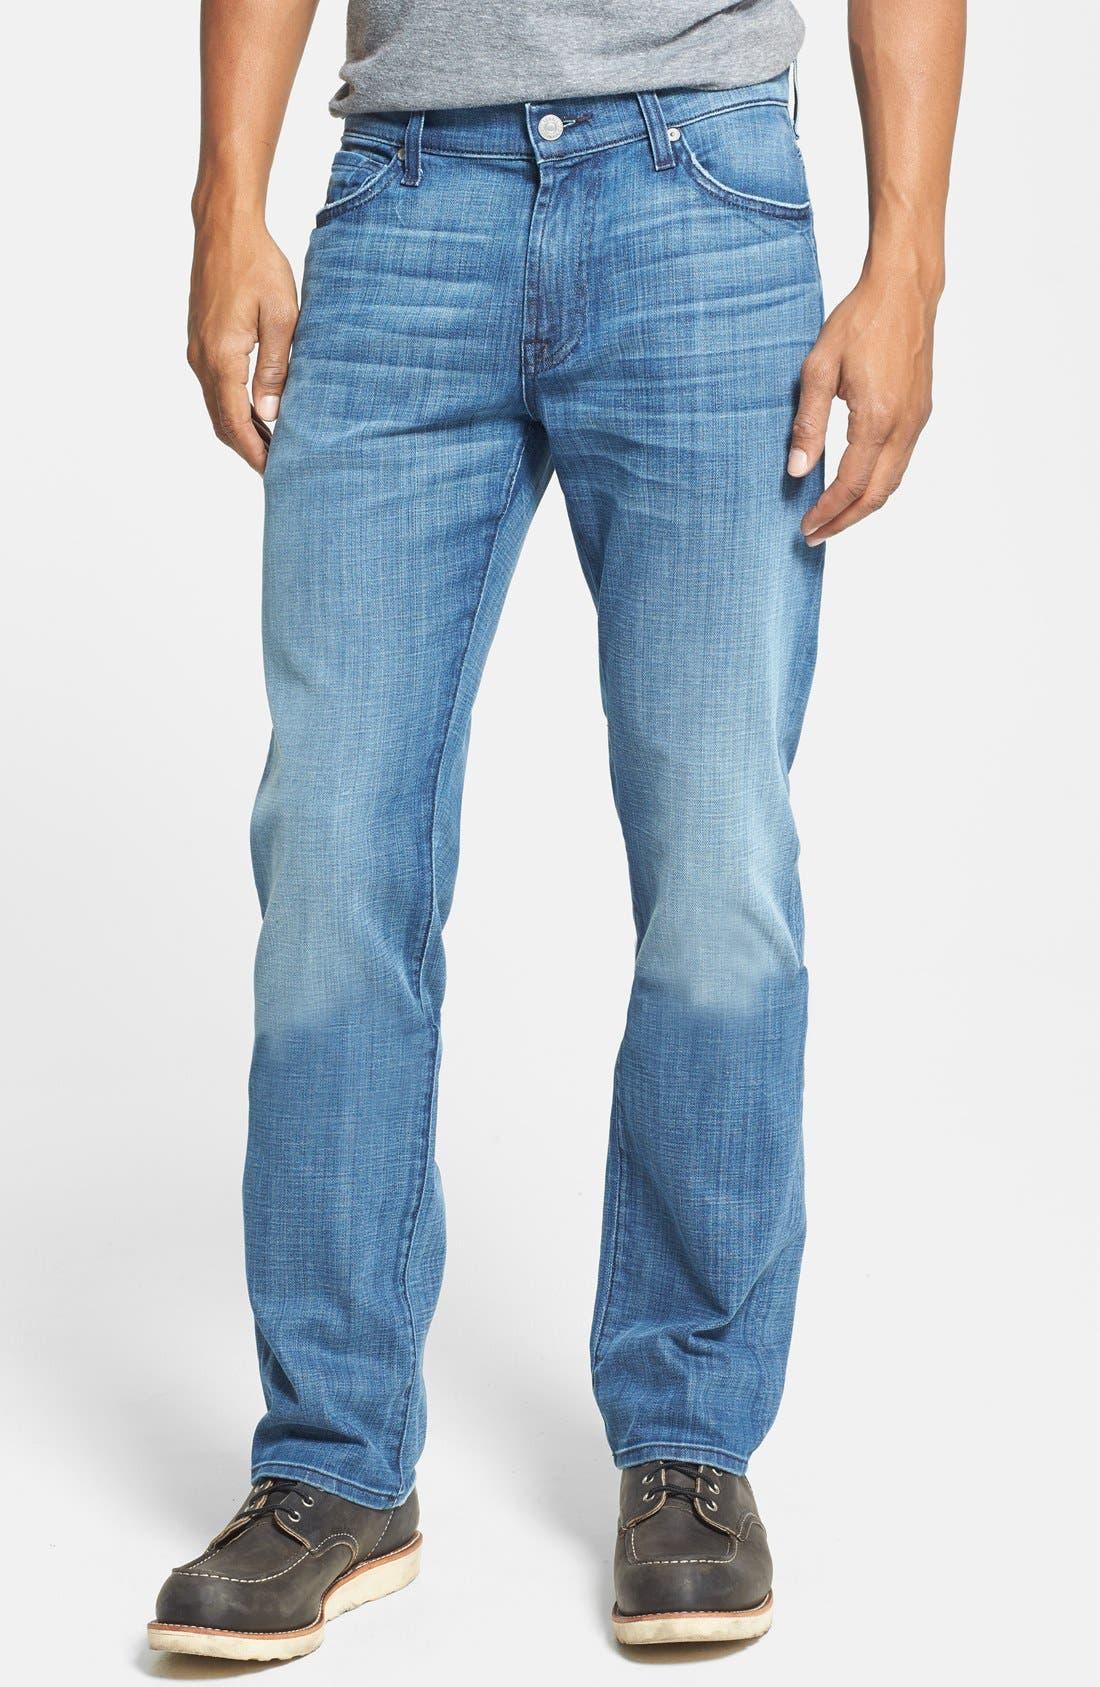 Alternate Image 1 Selected - 7 For All Mankind® 'Slimmy' Slim Straight Leg Jeans (Blue Stone)